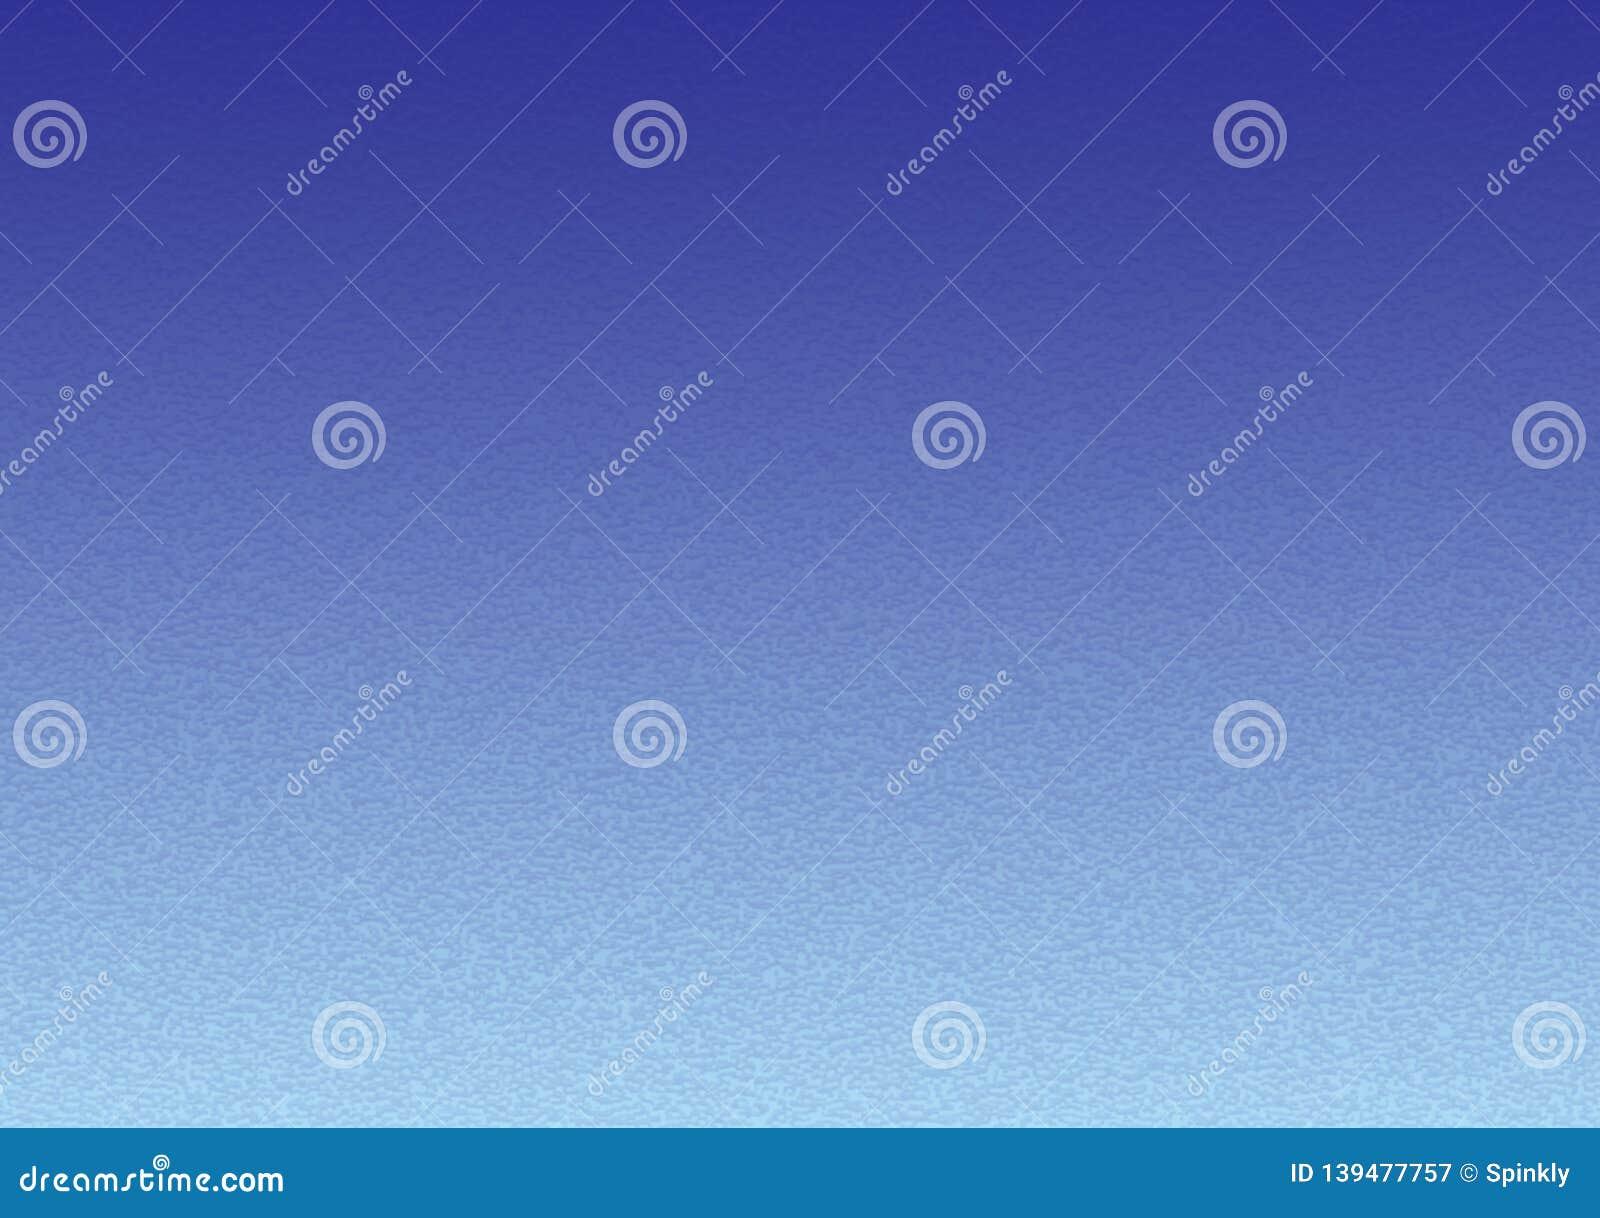 Blue gradient background wallpaper design